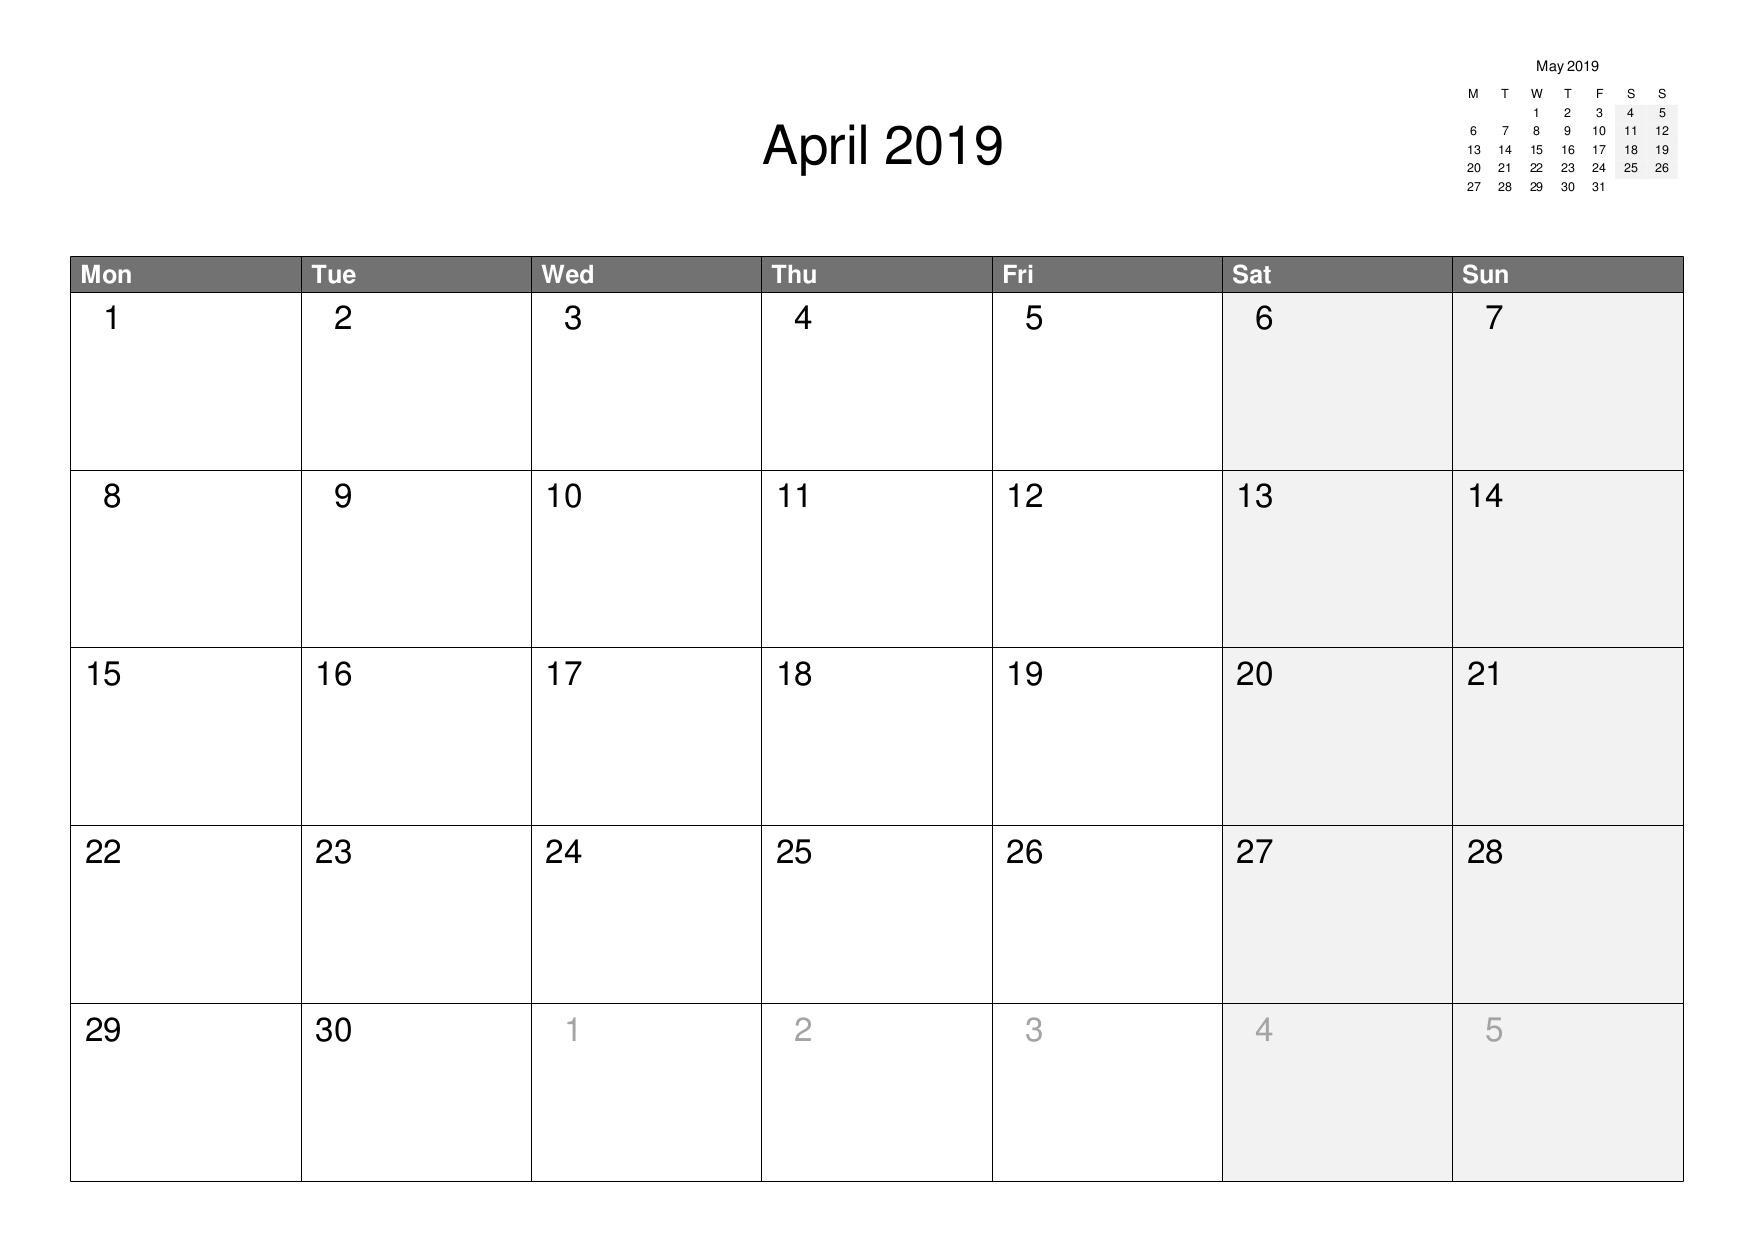 04-apr-2019-a4